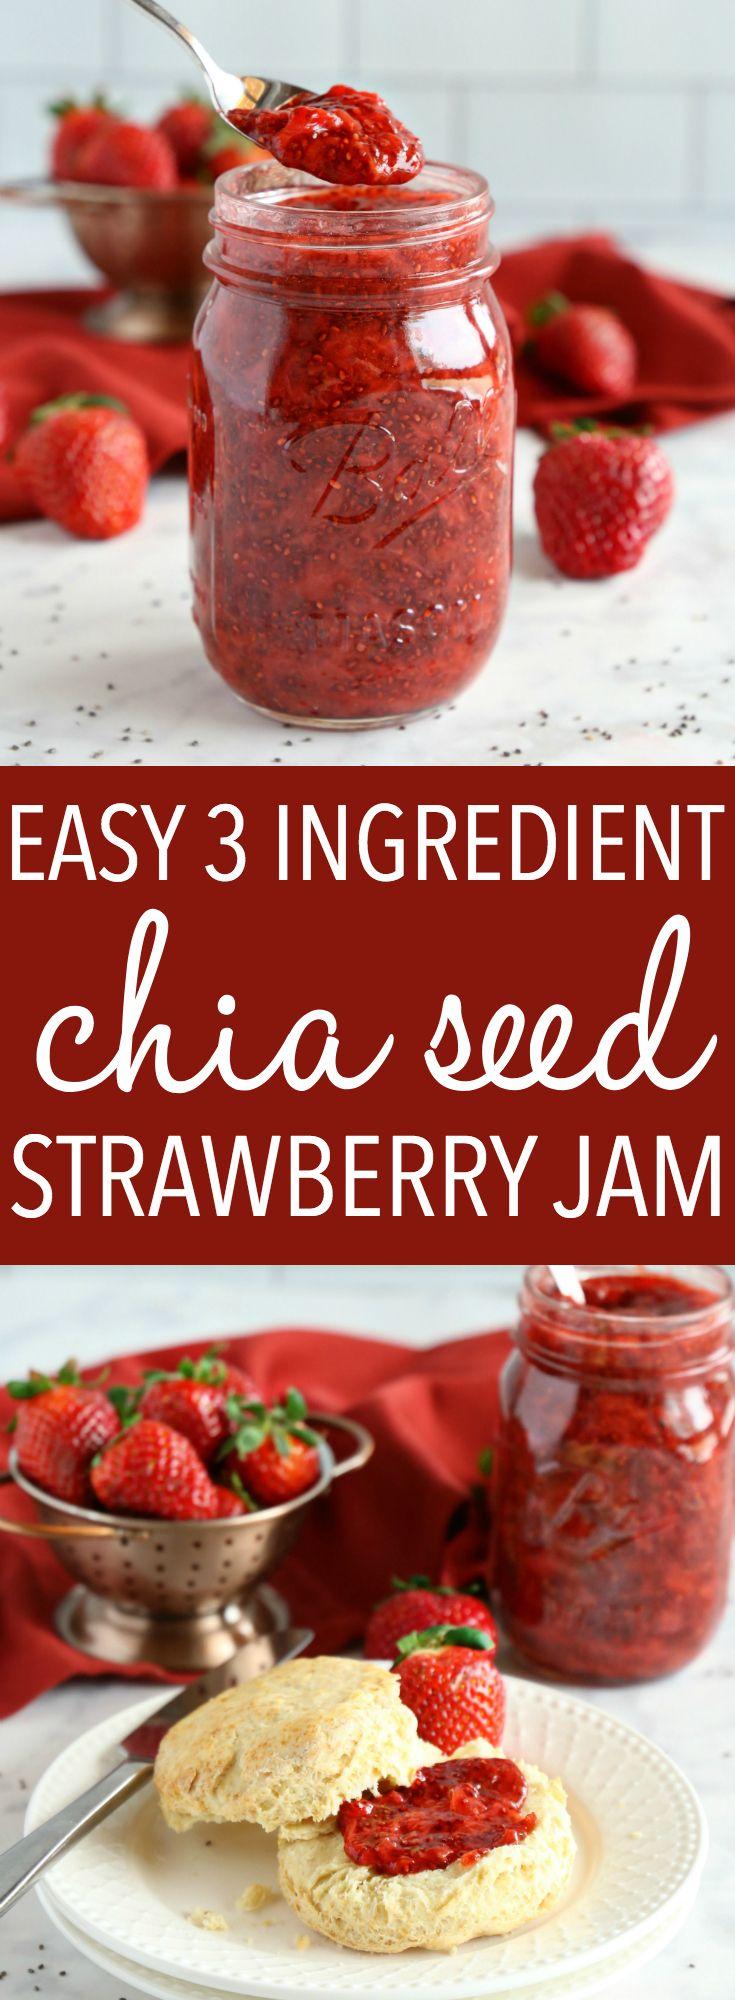 Easy 3Ingredient Chia Seed Strawberry Jam Recipe